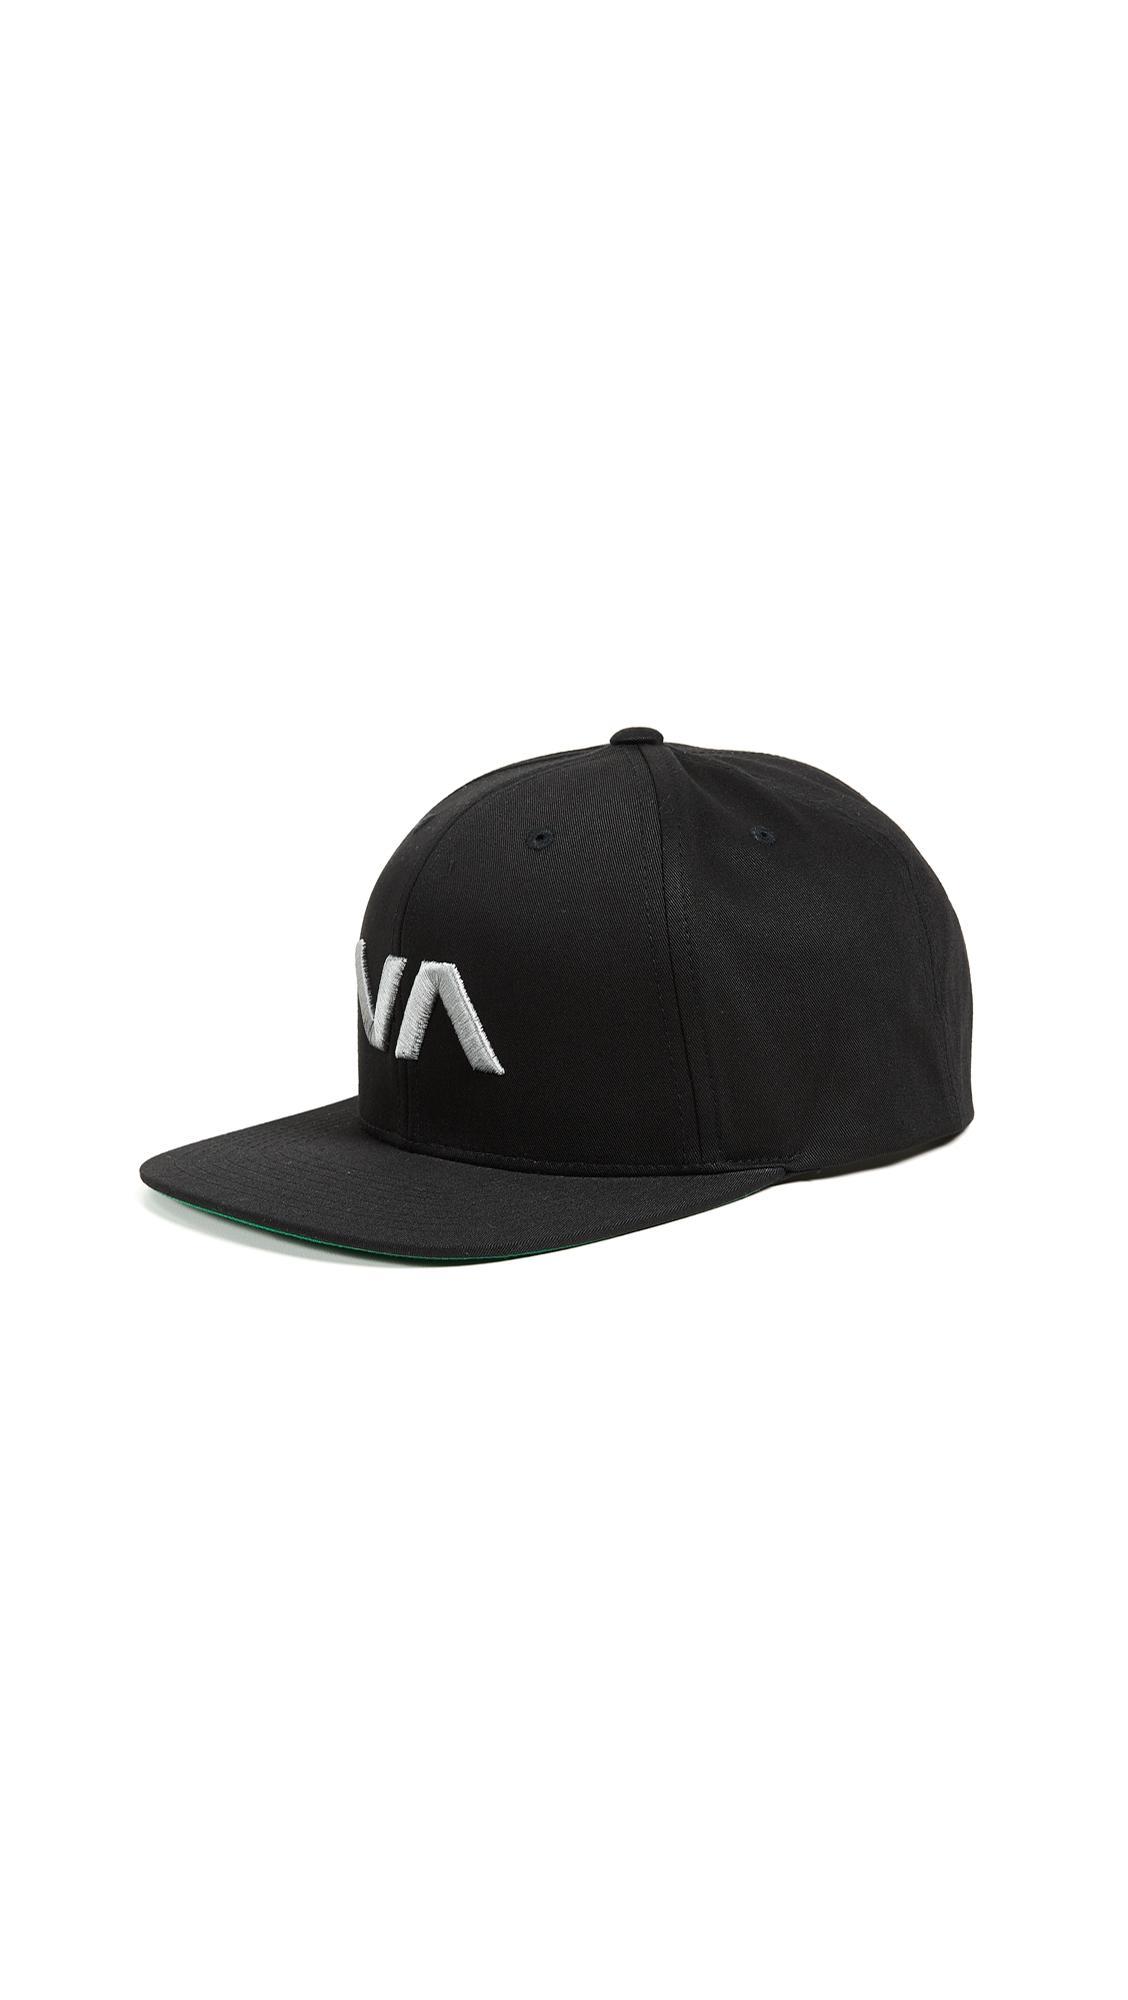 Rvca Va Snapback Ii Hat In Black